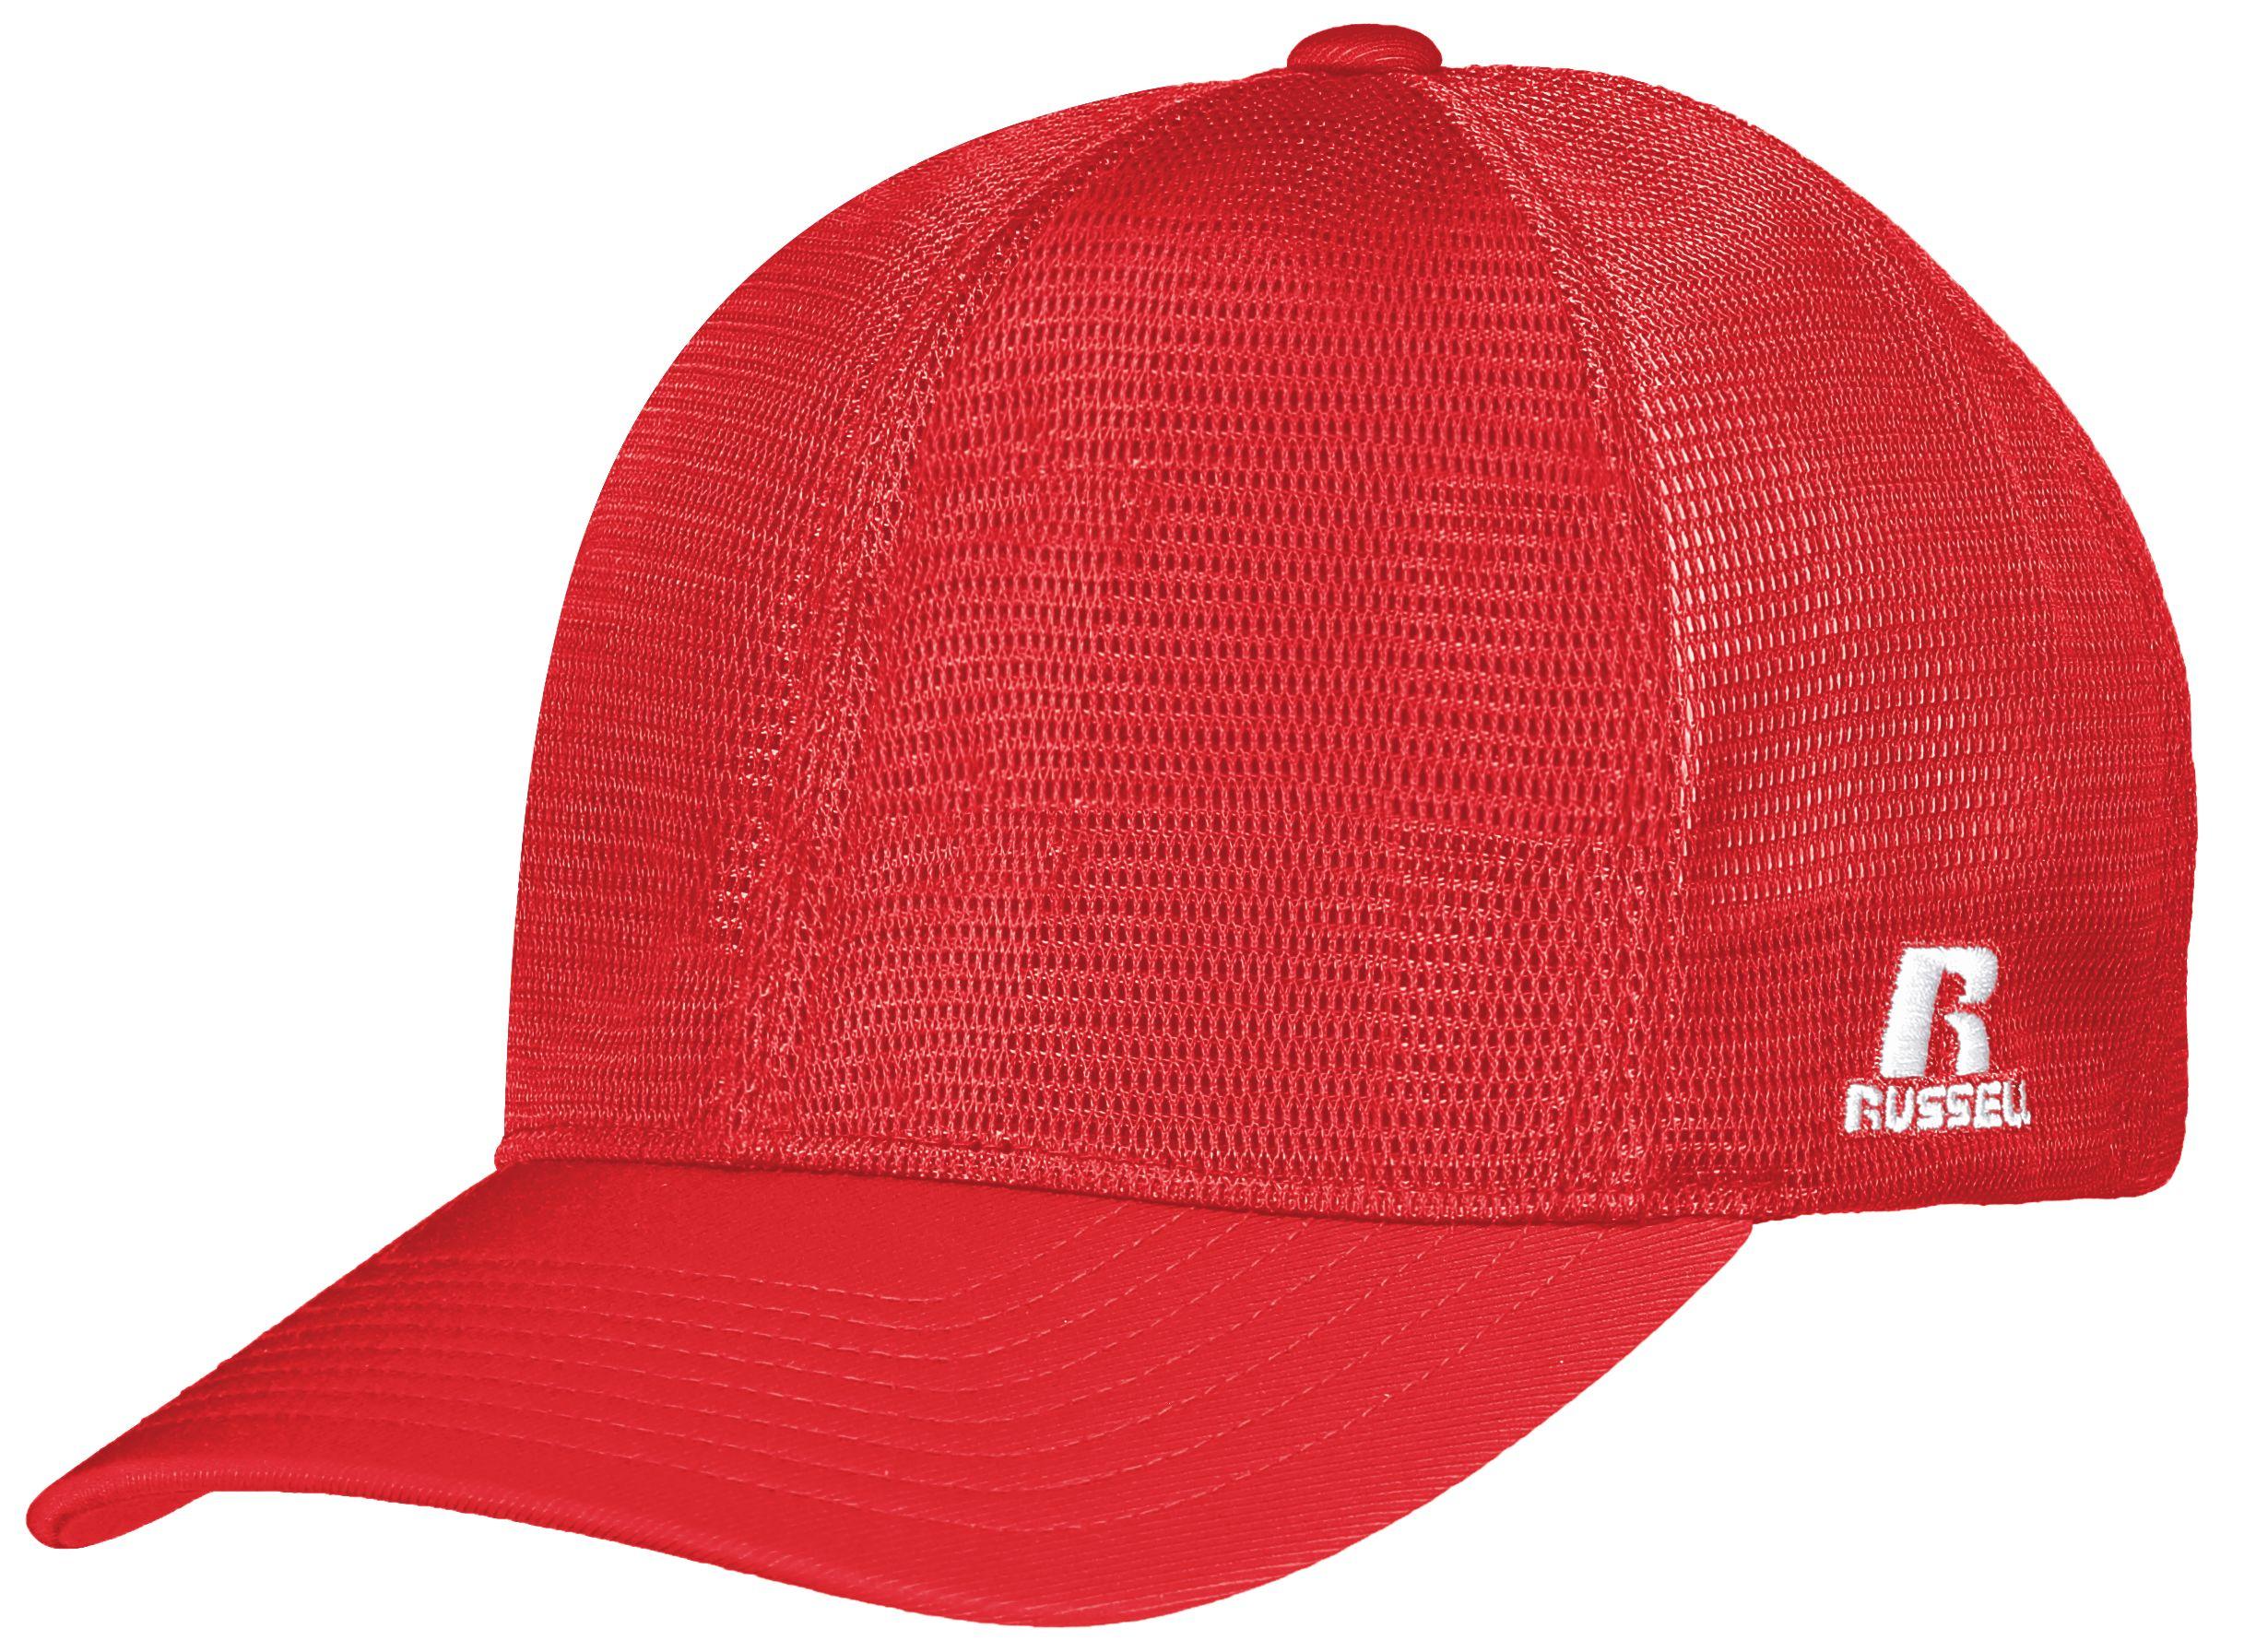 Flexfit 360 Mesh Cap - True Red